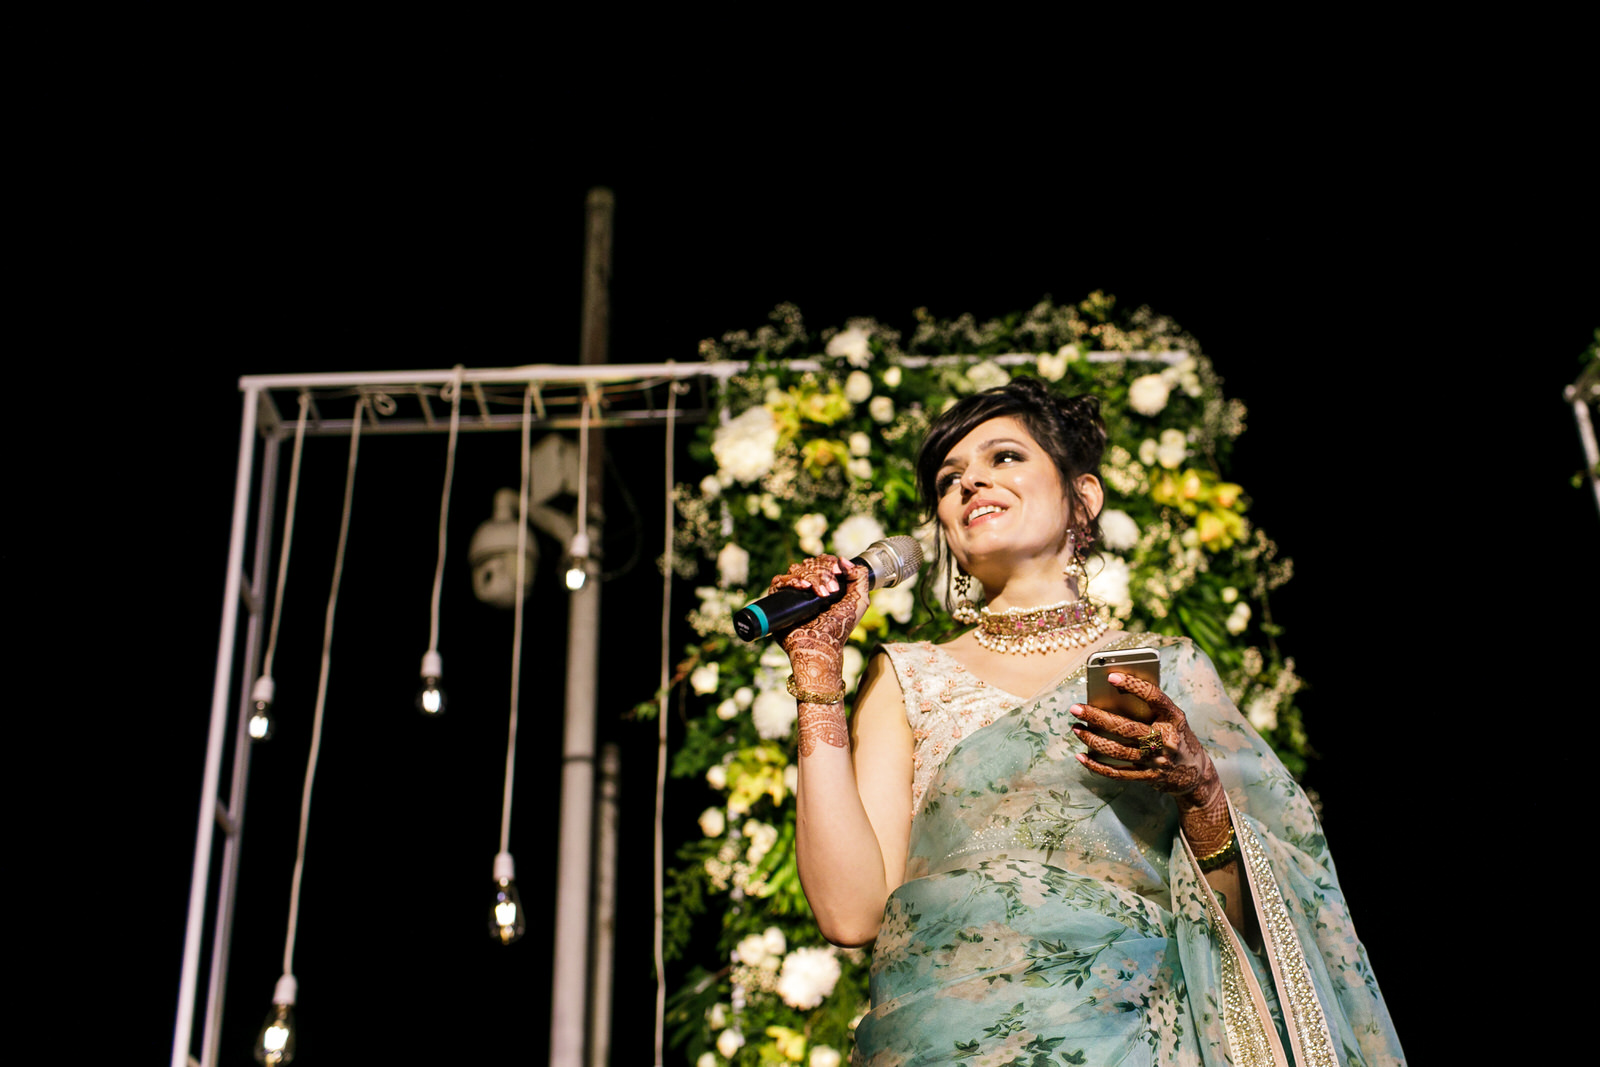 S&M_The Story_www.samandekta.com-109-1.jpg